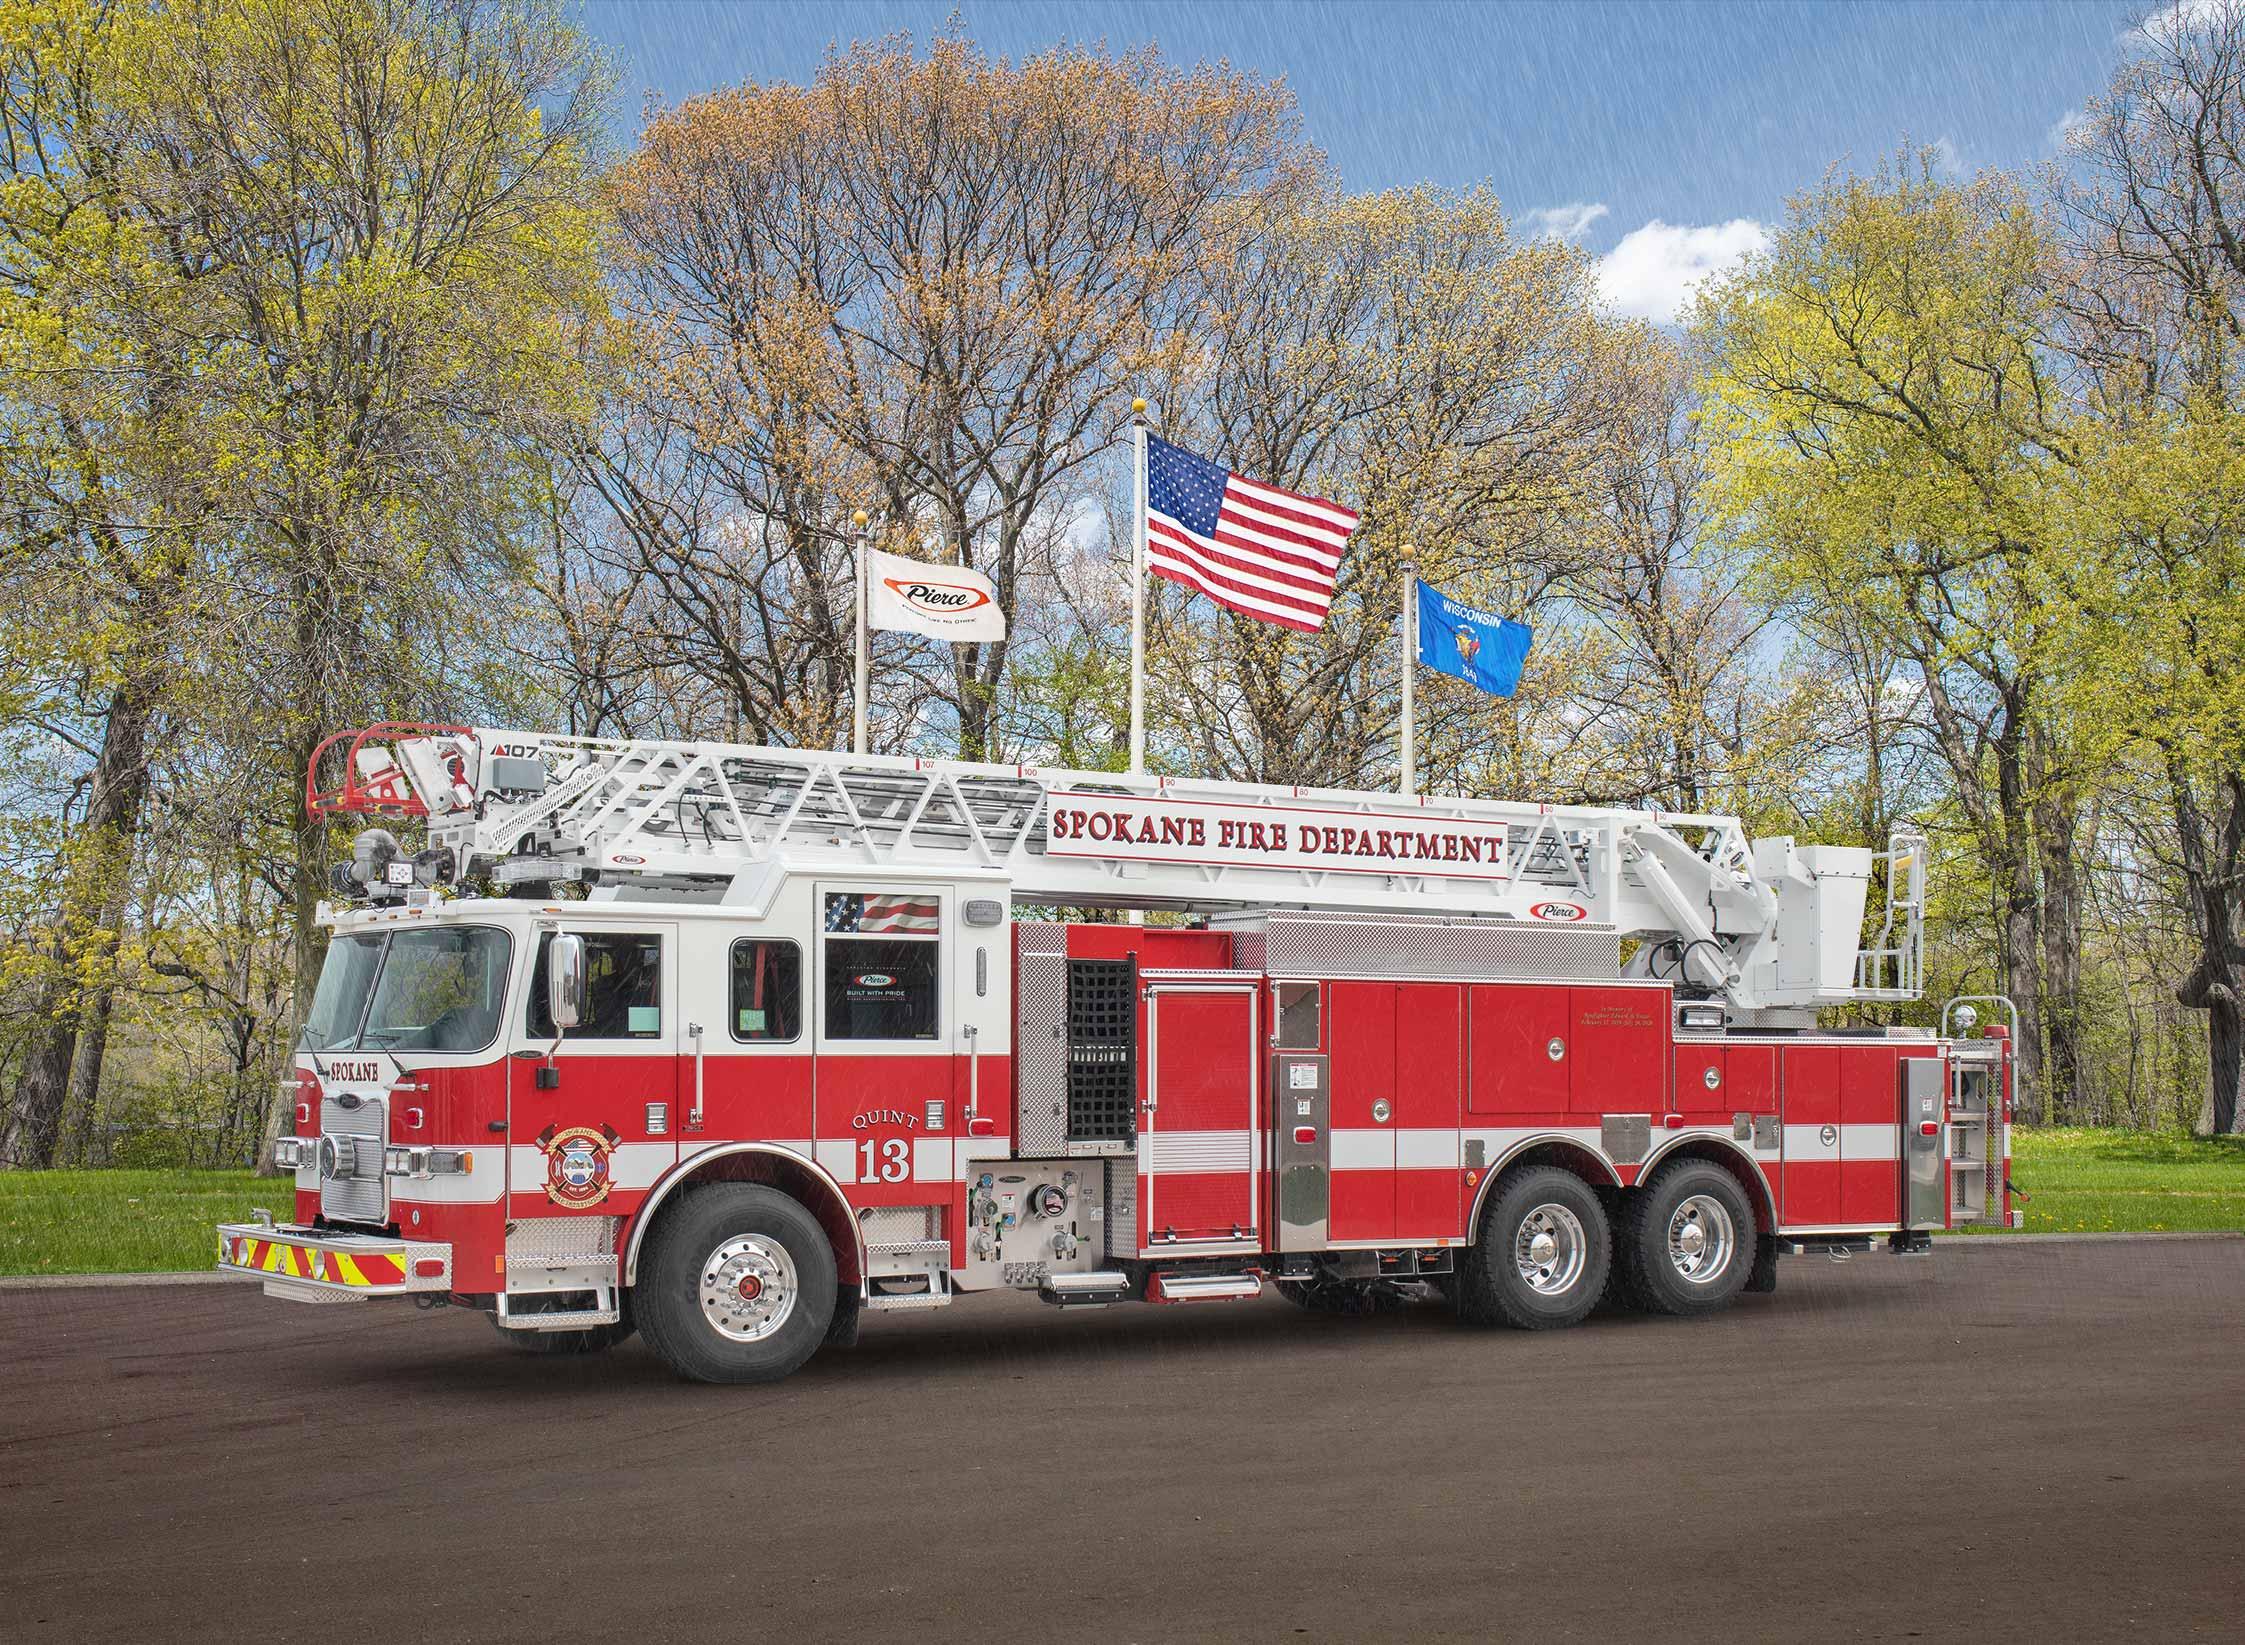 Spokane Fire Department - Aerial